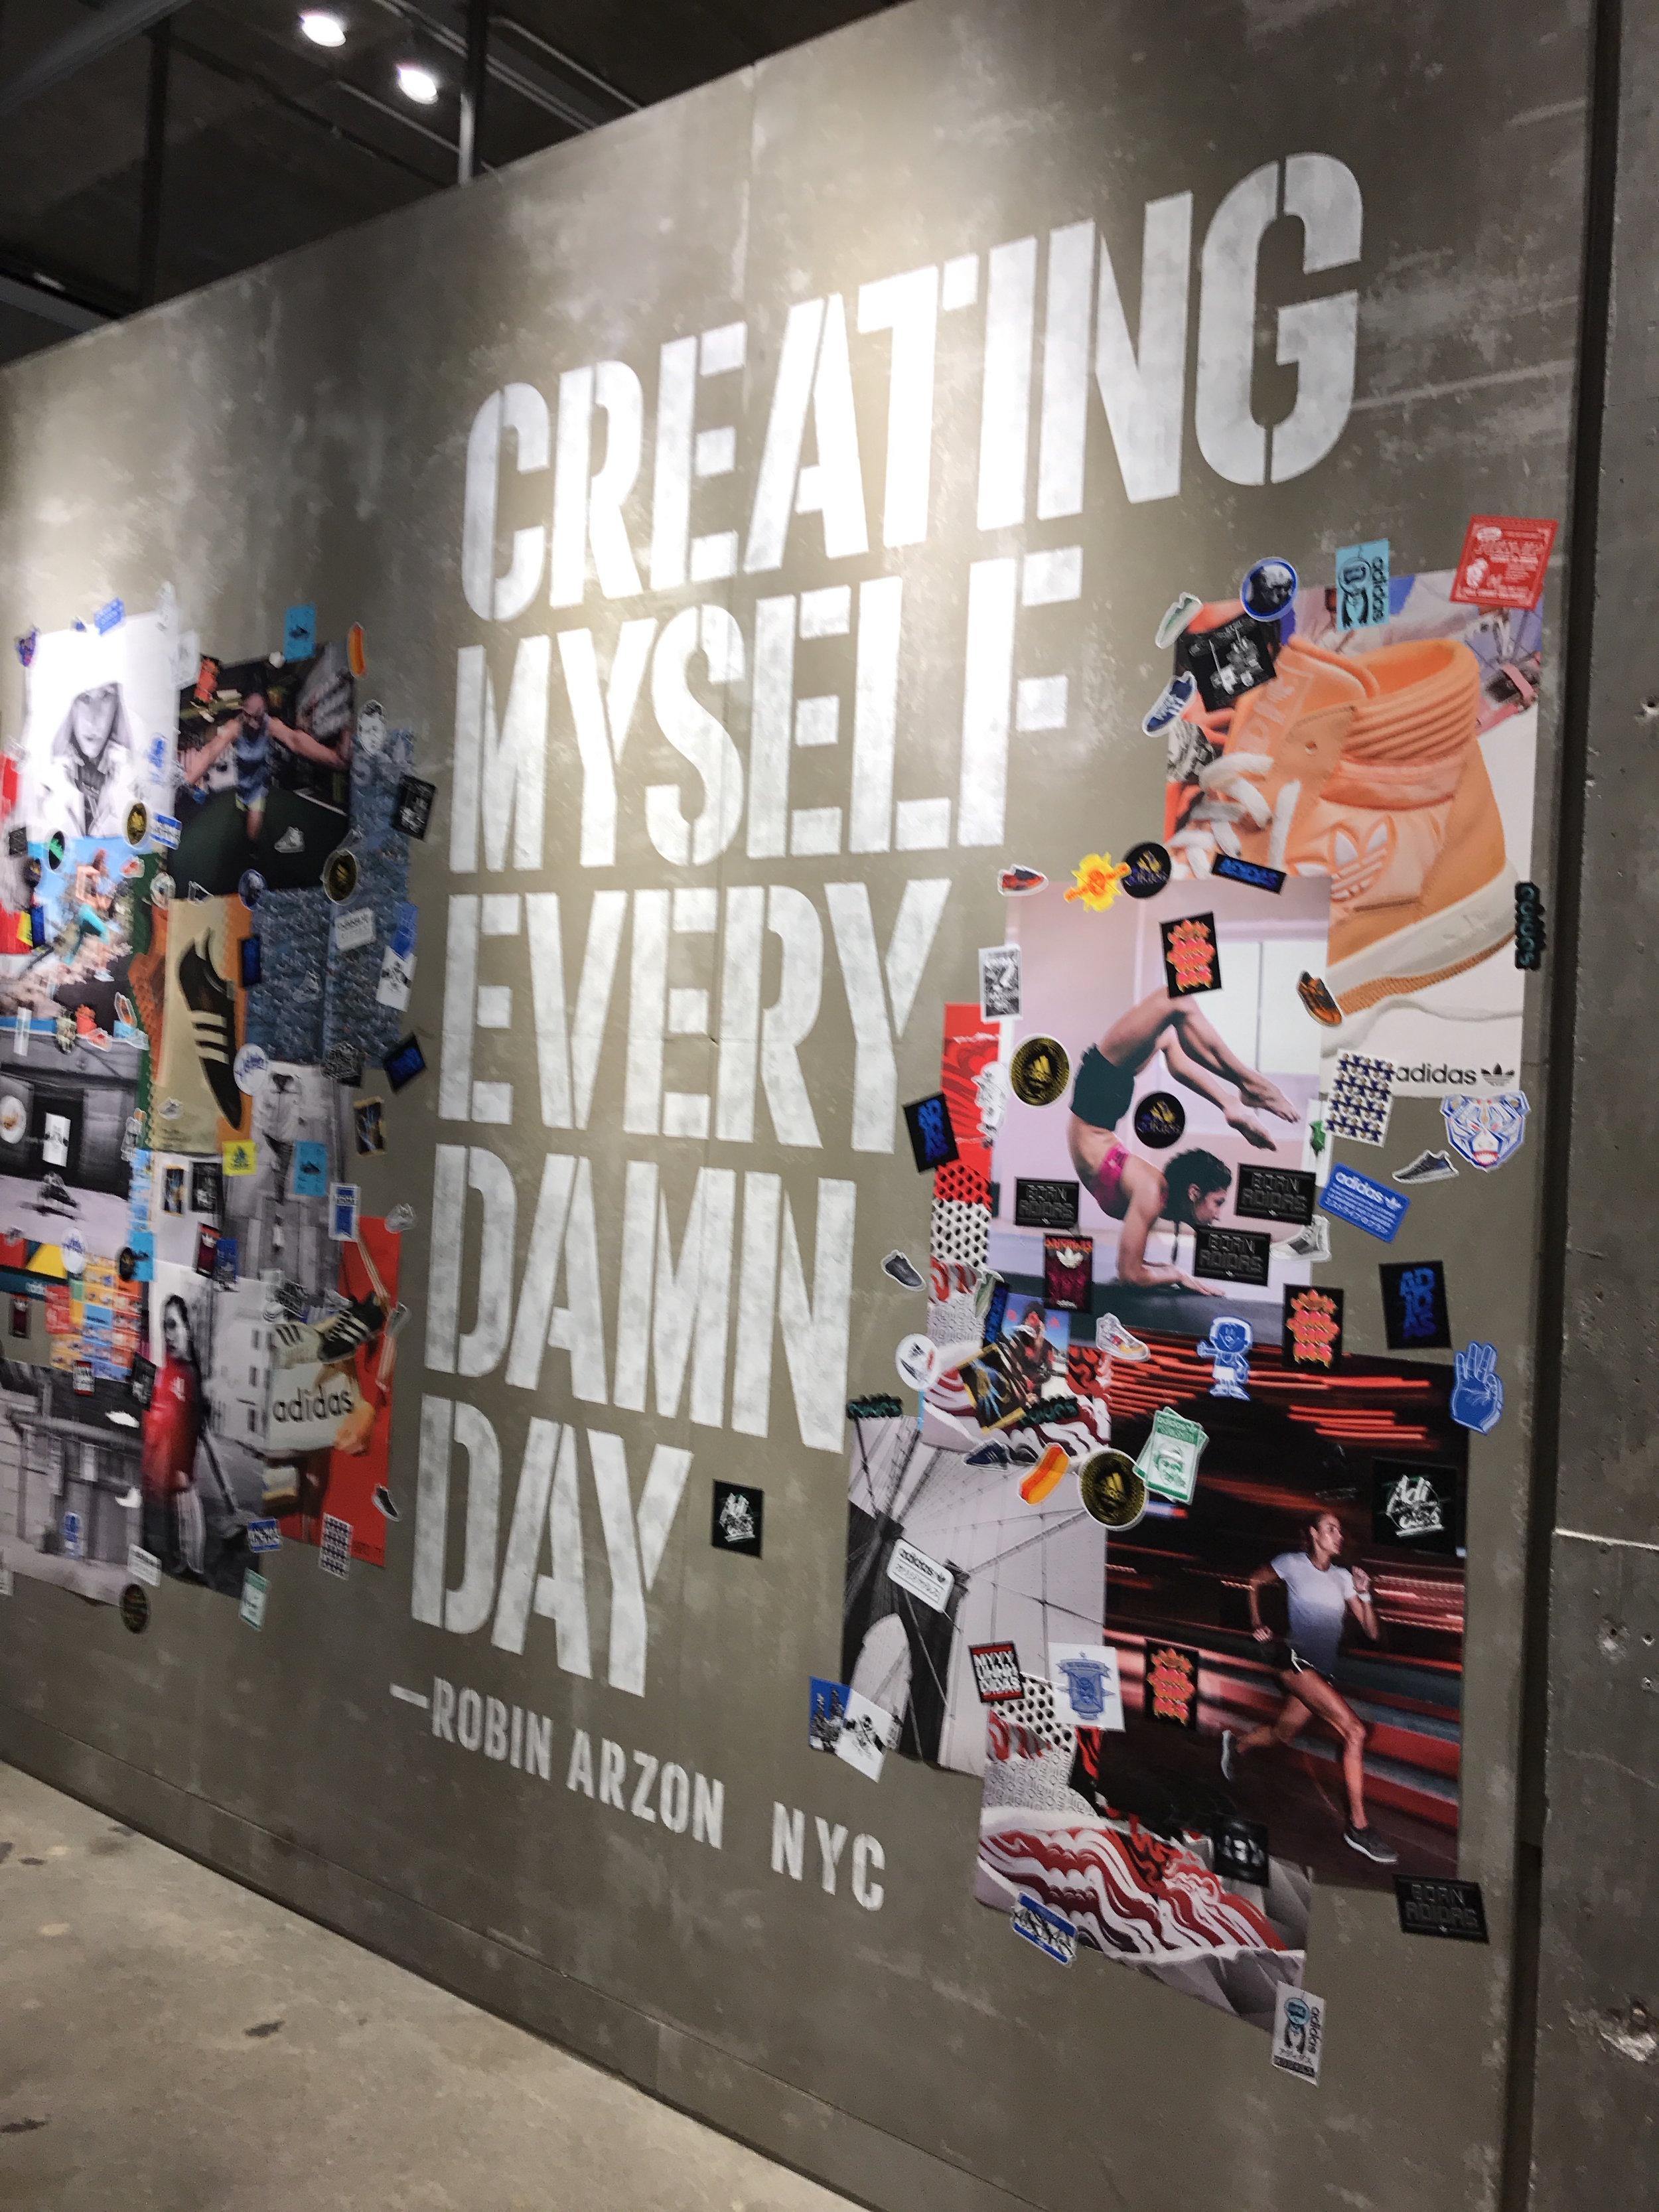 Último Disciplinario chocar  Why I Like the New Adidas Store — Captain Customer